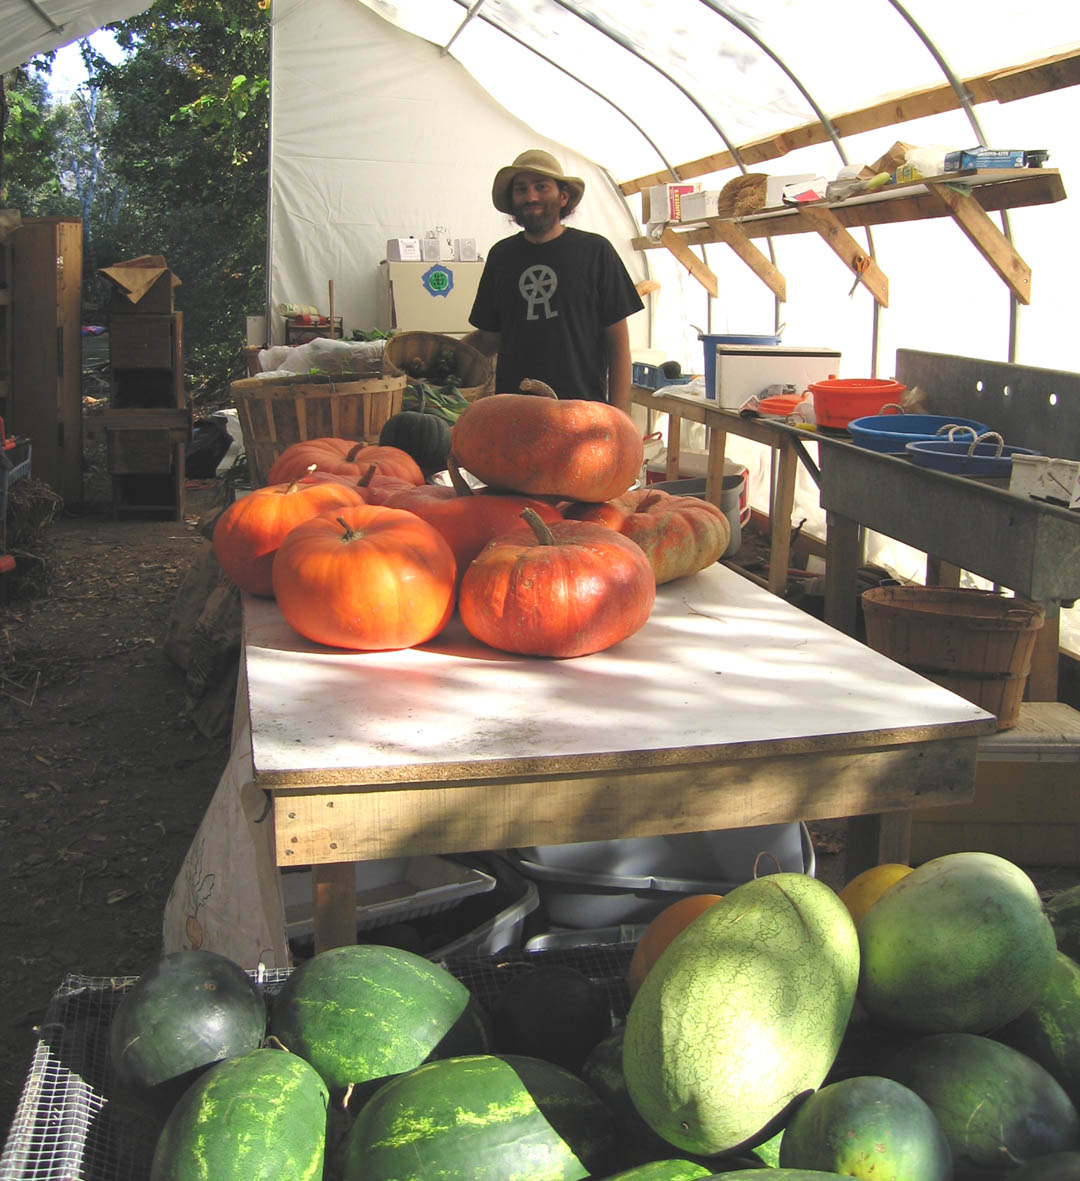 Oliver Teleion Holon Retreat and CSA Farm